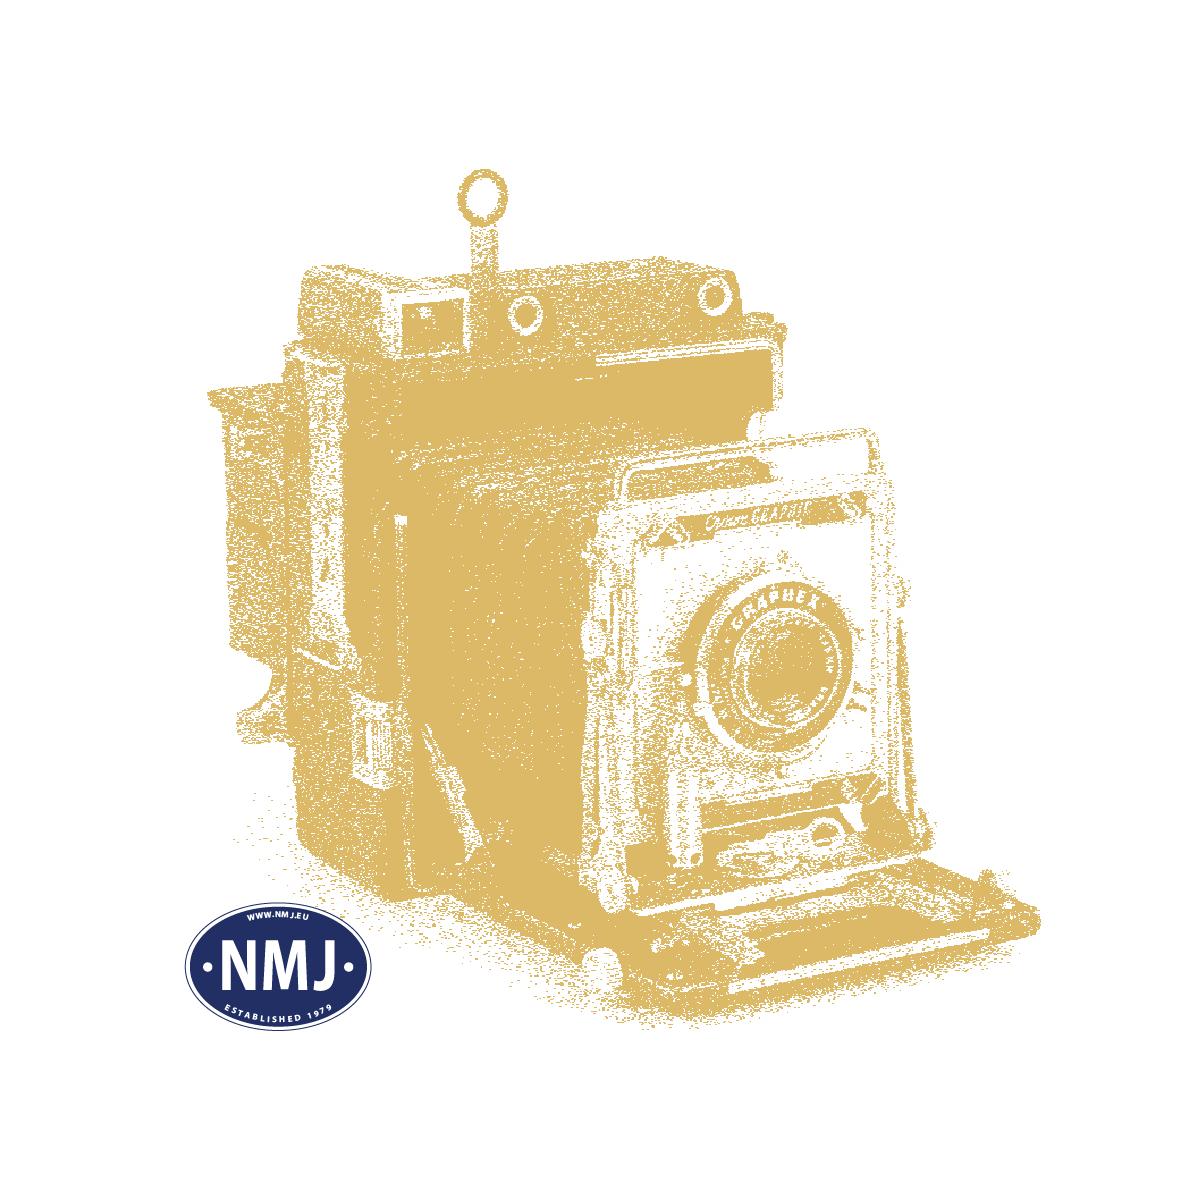 WODJP5614 - N Cool Convertible, Just Plug, Funksjonsmodell m/ lys